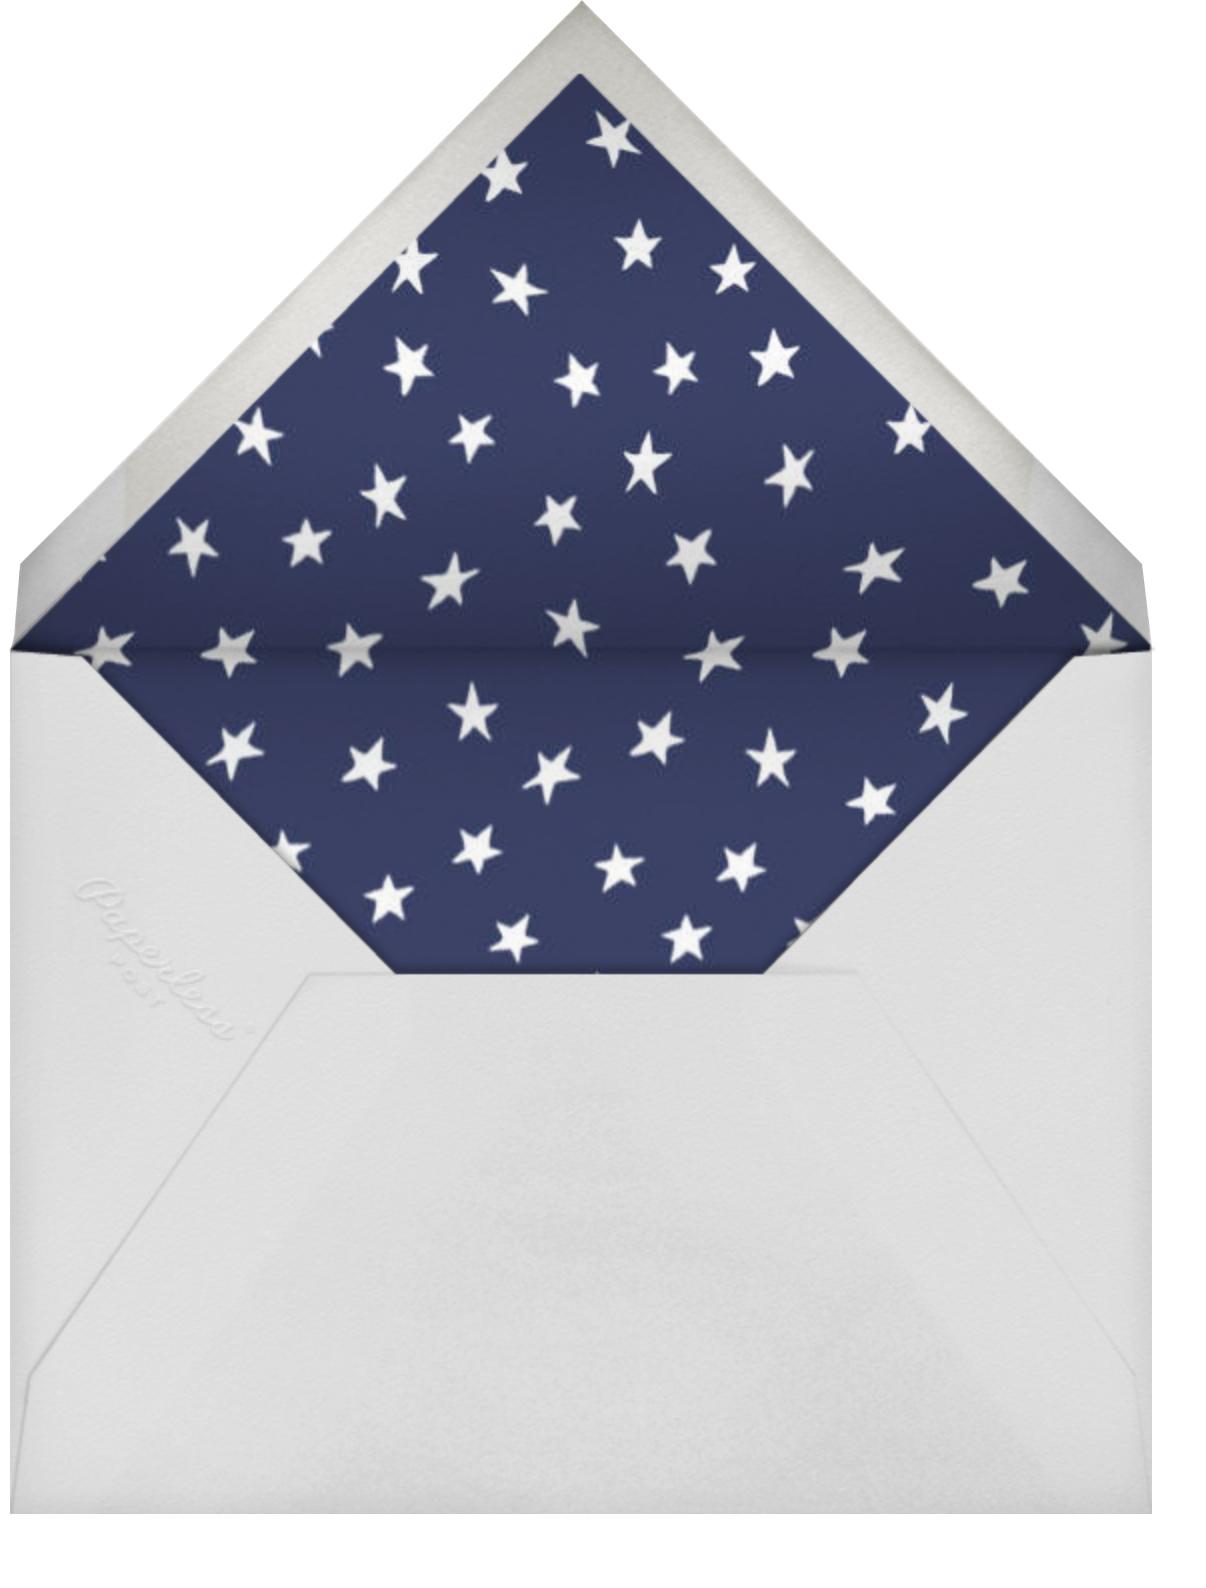 American Pastime - Paperless Post - Envelope